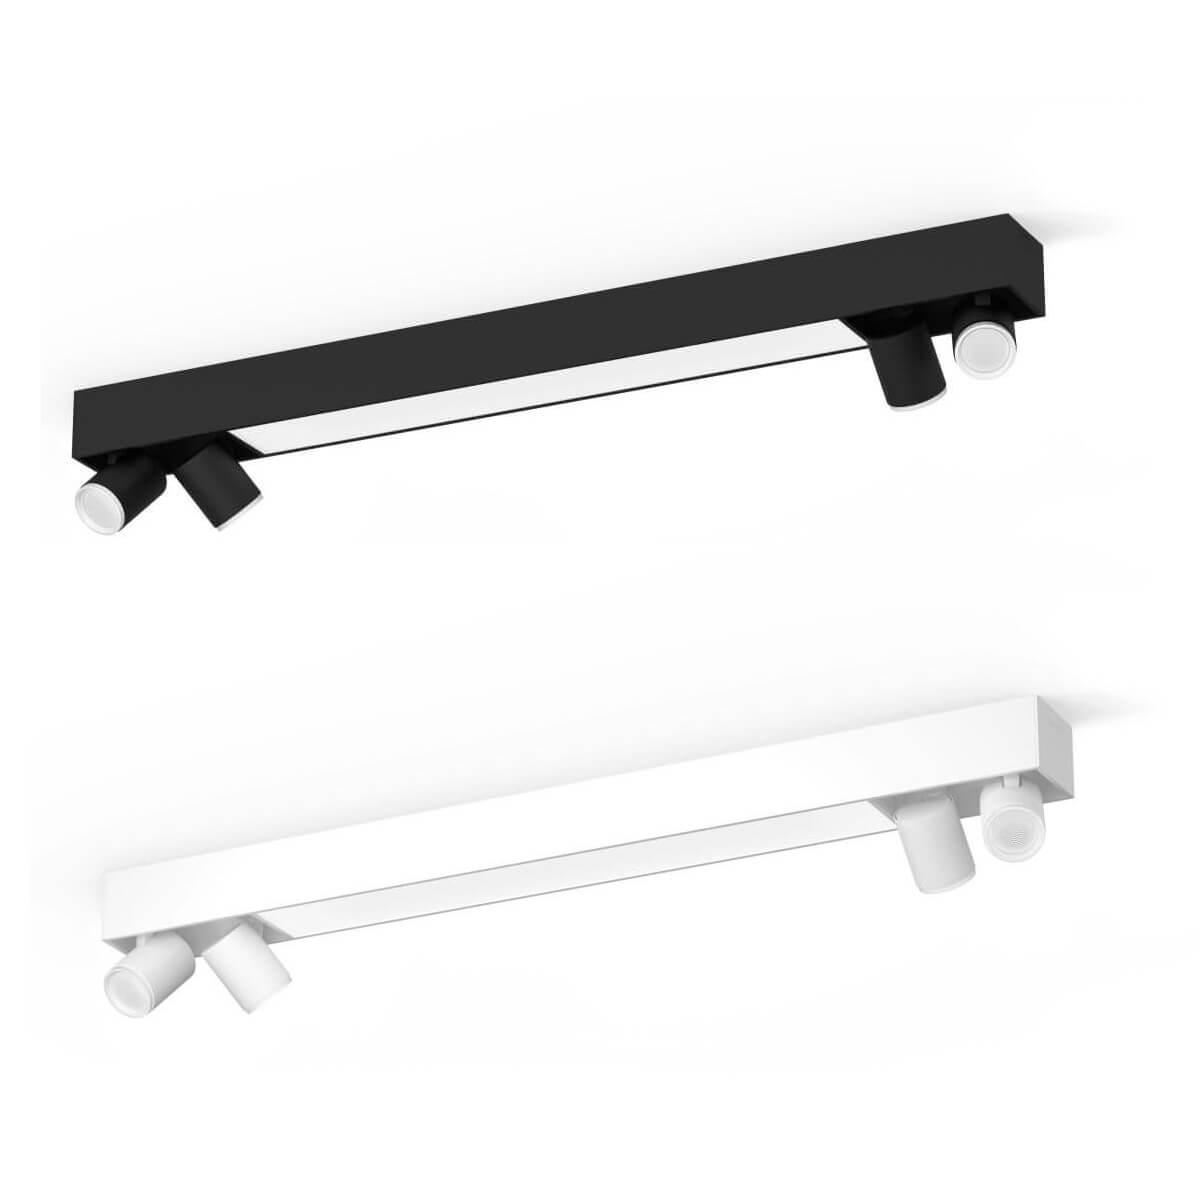 Philips Hue White & Color Ambiance Centris Strahler 4 flammig Spots Lightbar Schwarz oder weiß